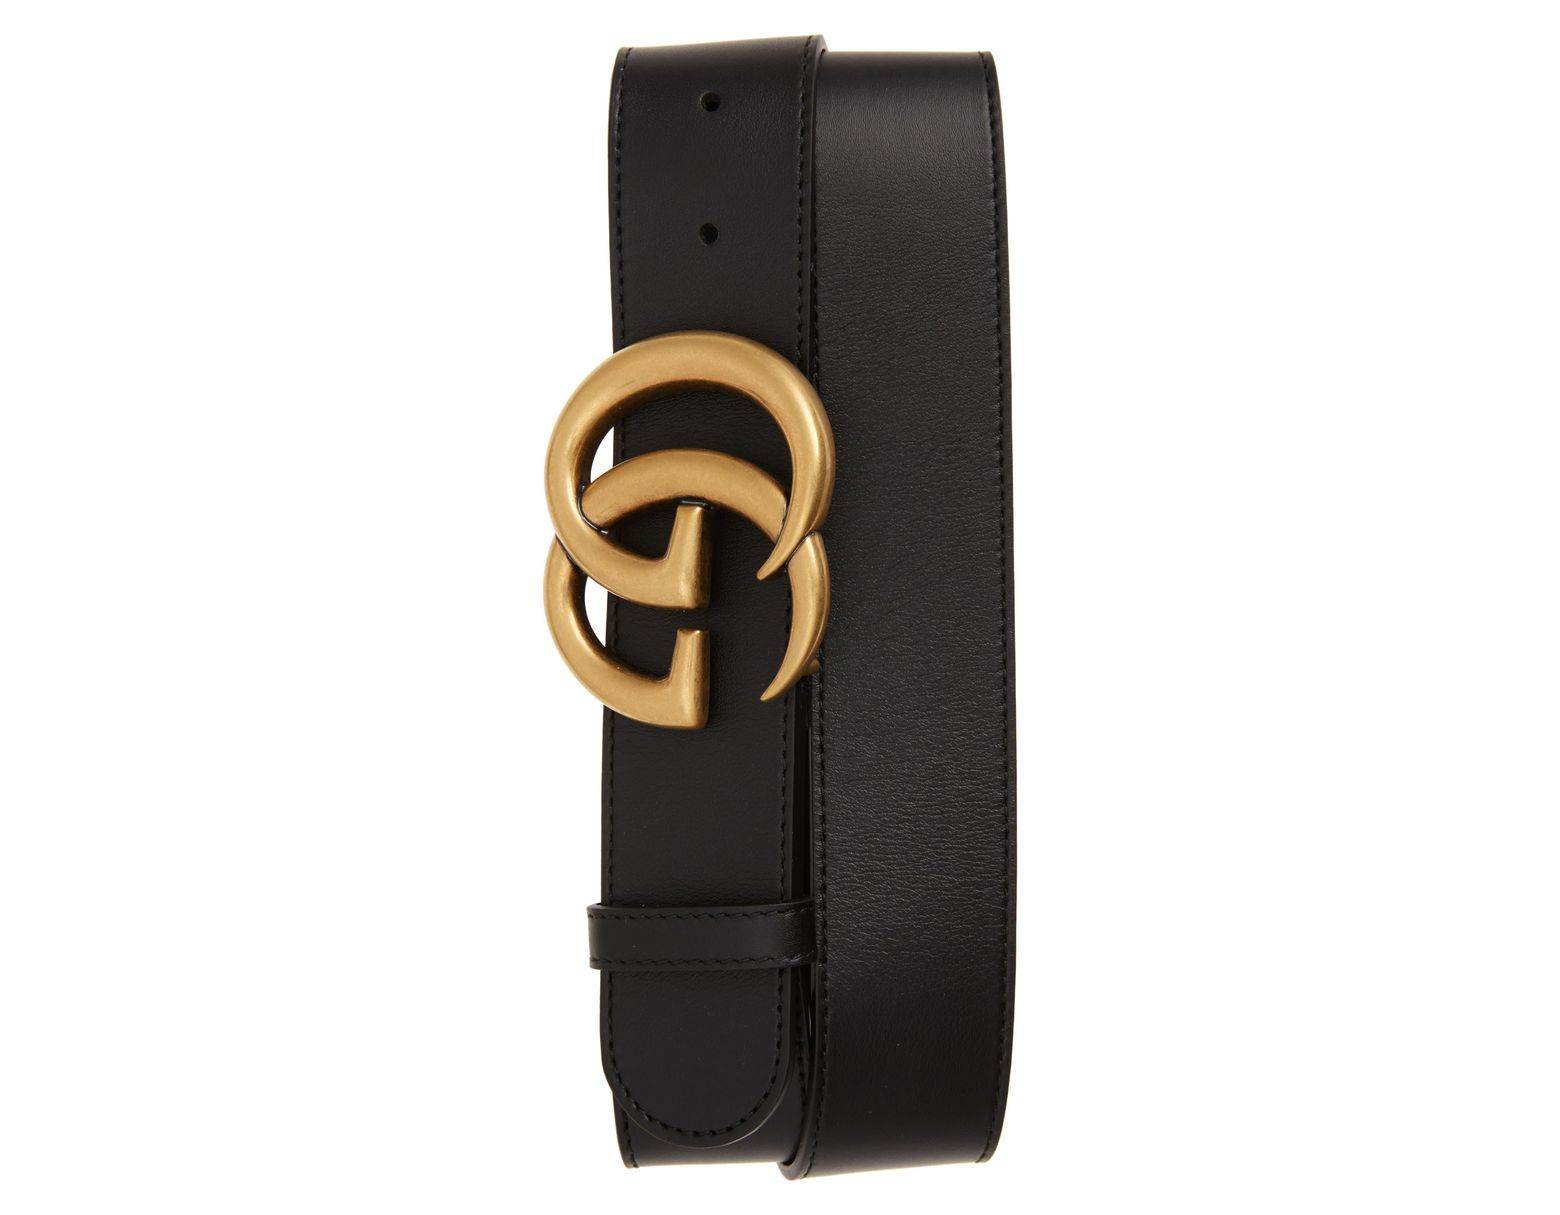 f559c4811 Gucci Cintura Donna Leather Belt in Black - Lyst